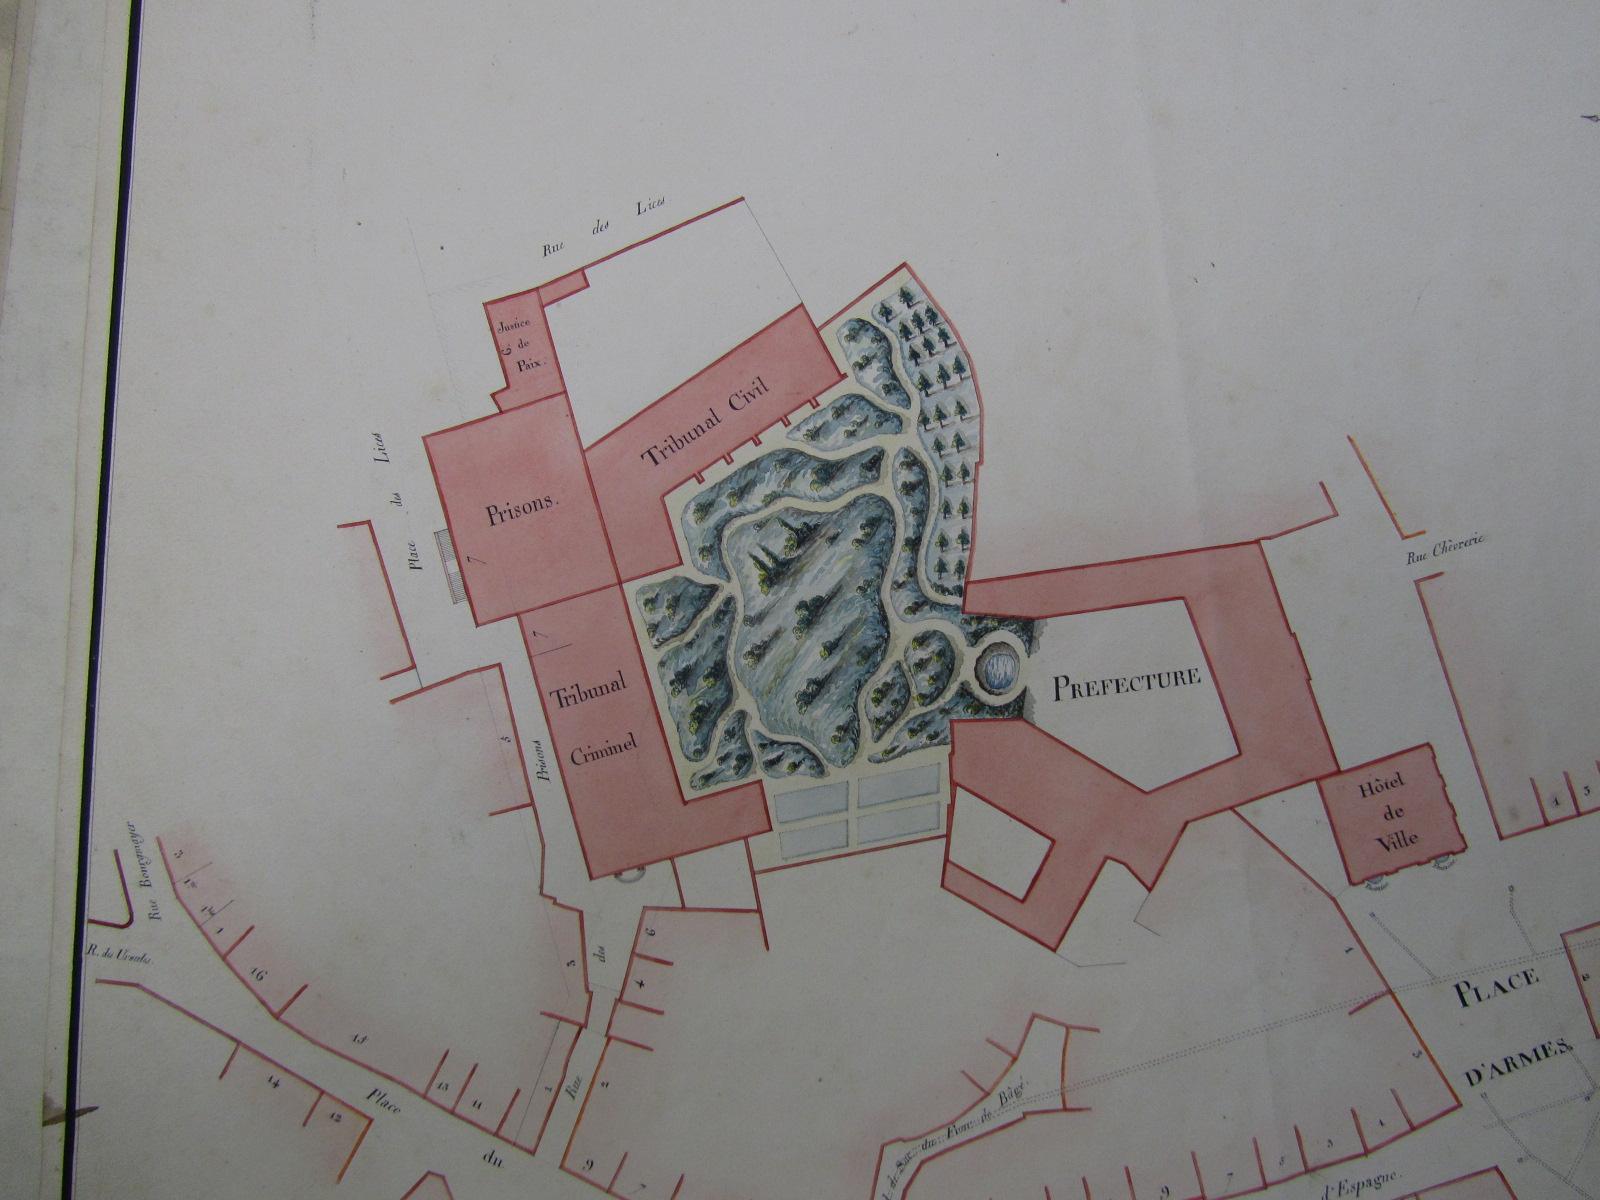 L ancienne prison de bourg en bresse ain tienne for Plattard carrelage bourg en bresse